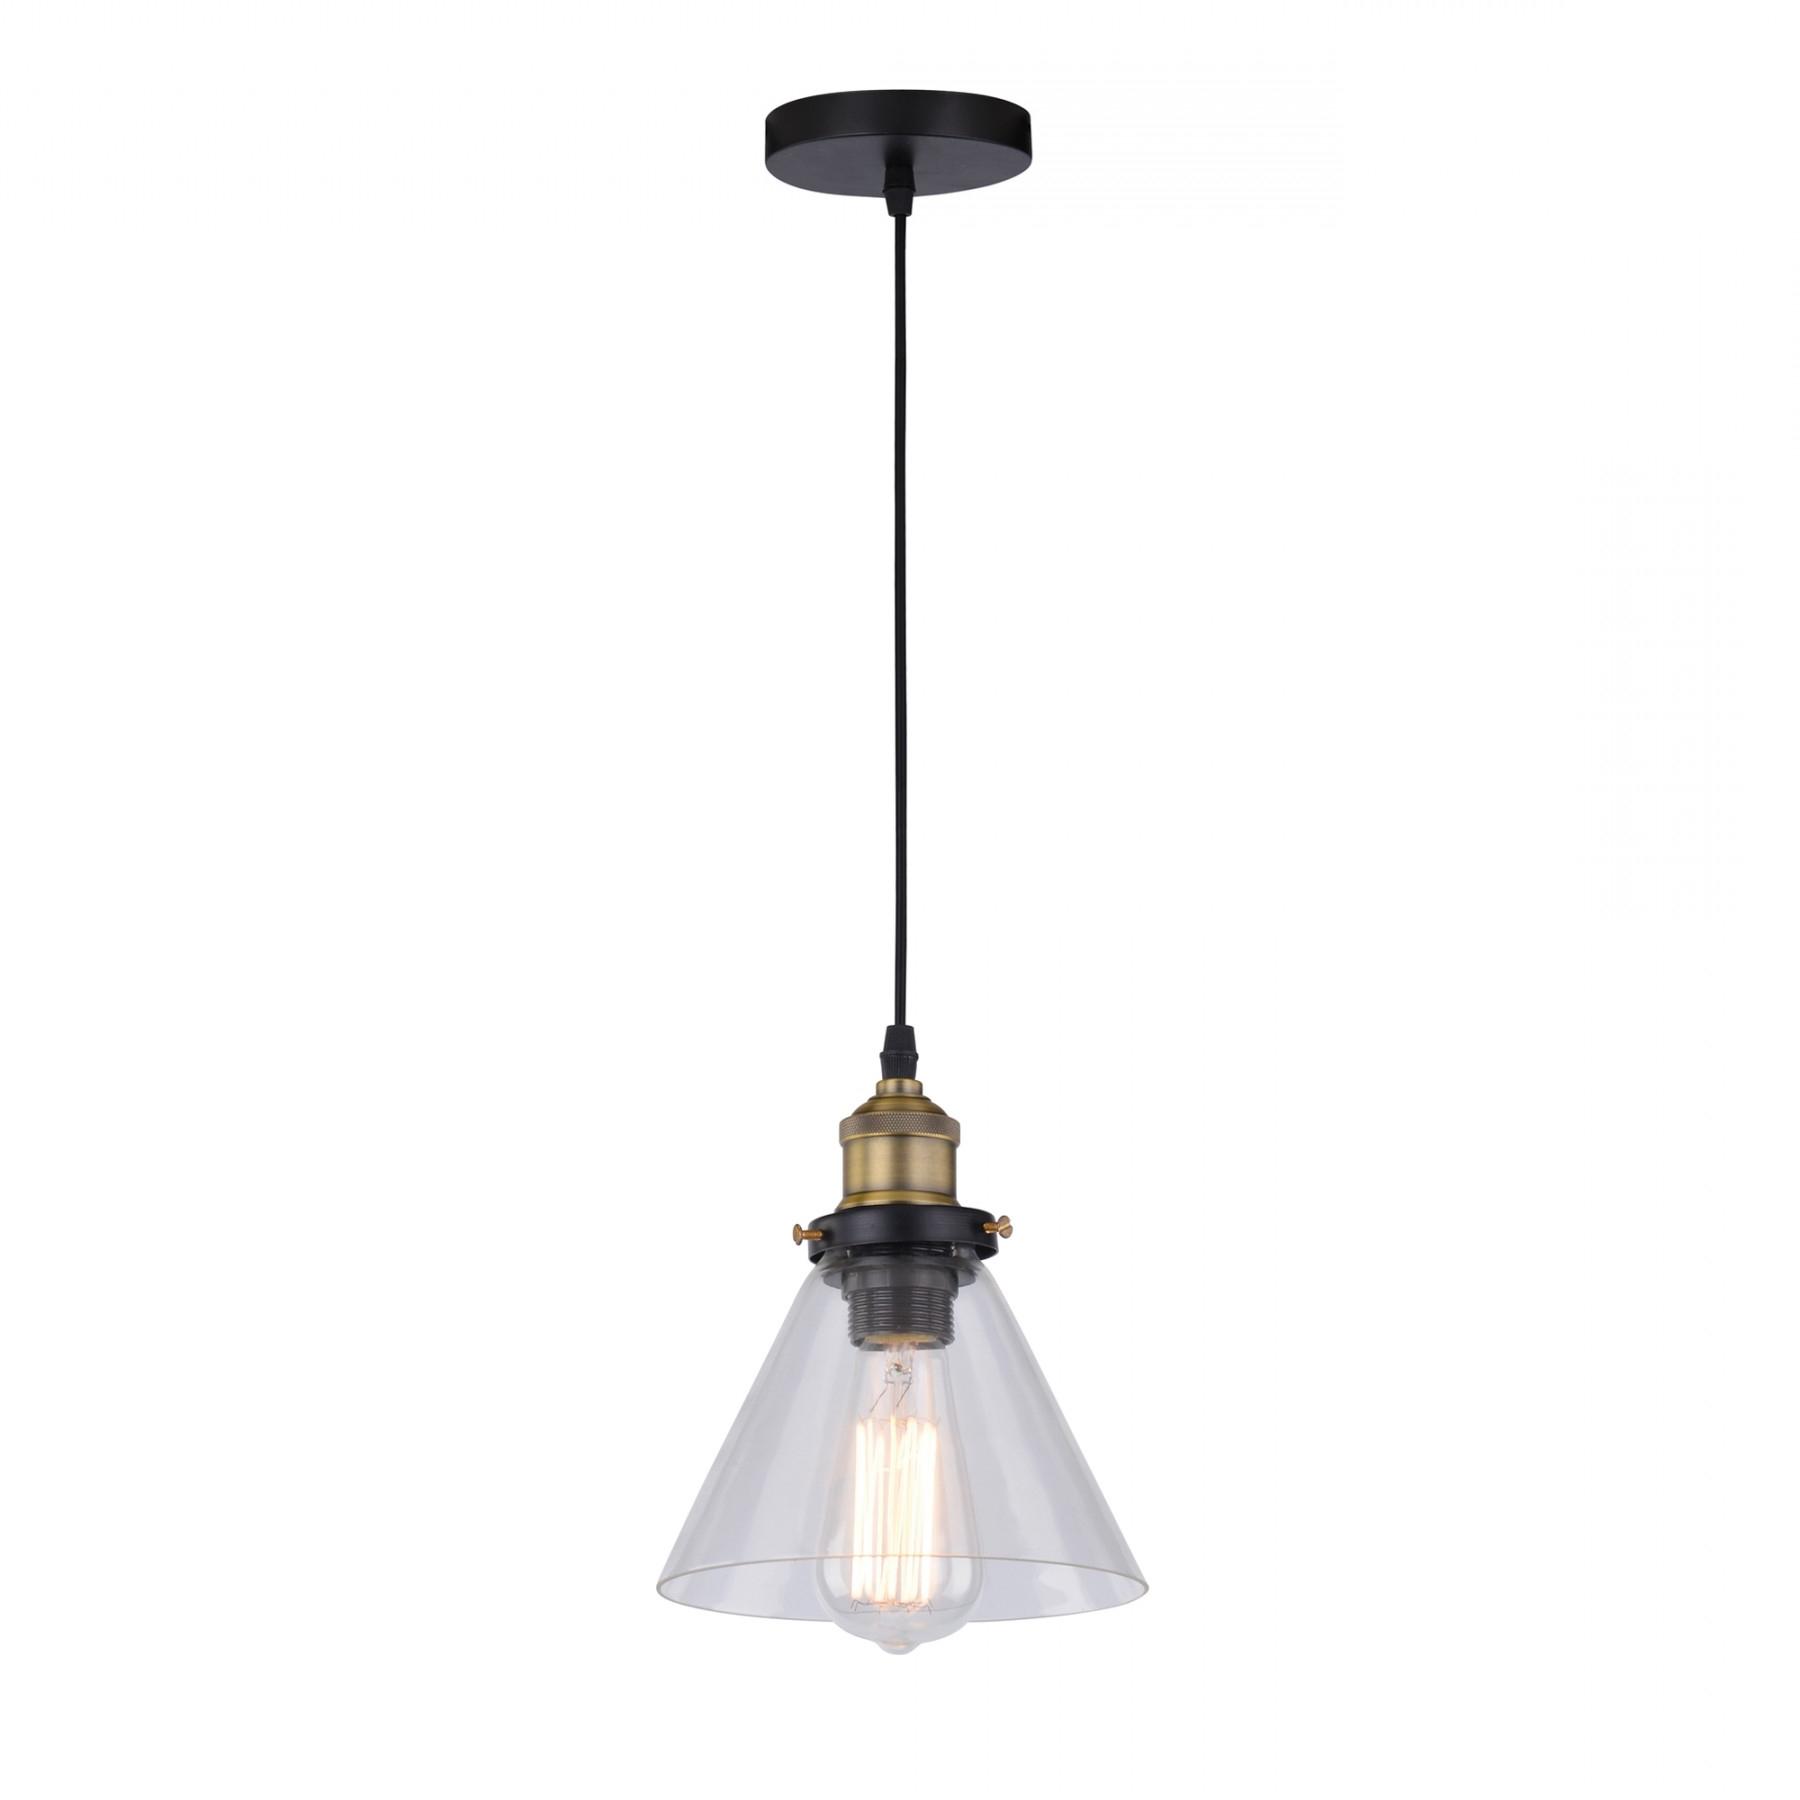 Britop Conrad Cone Ceiling Pendant Light throughout Famous Guro 1-Light Cone Pendants